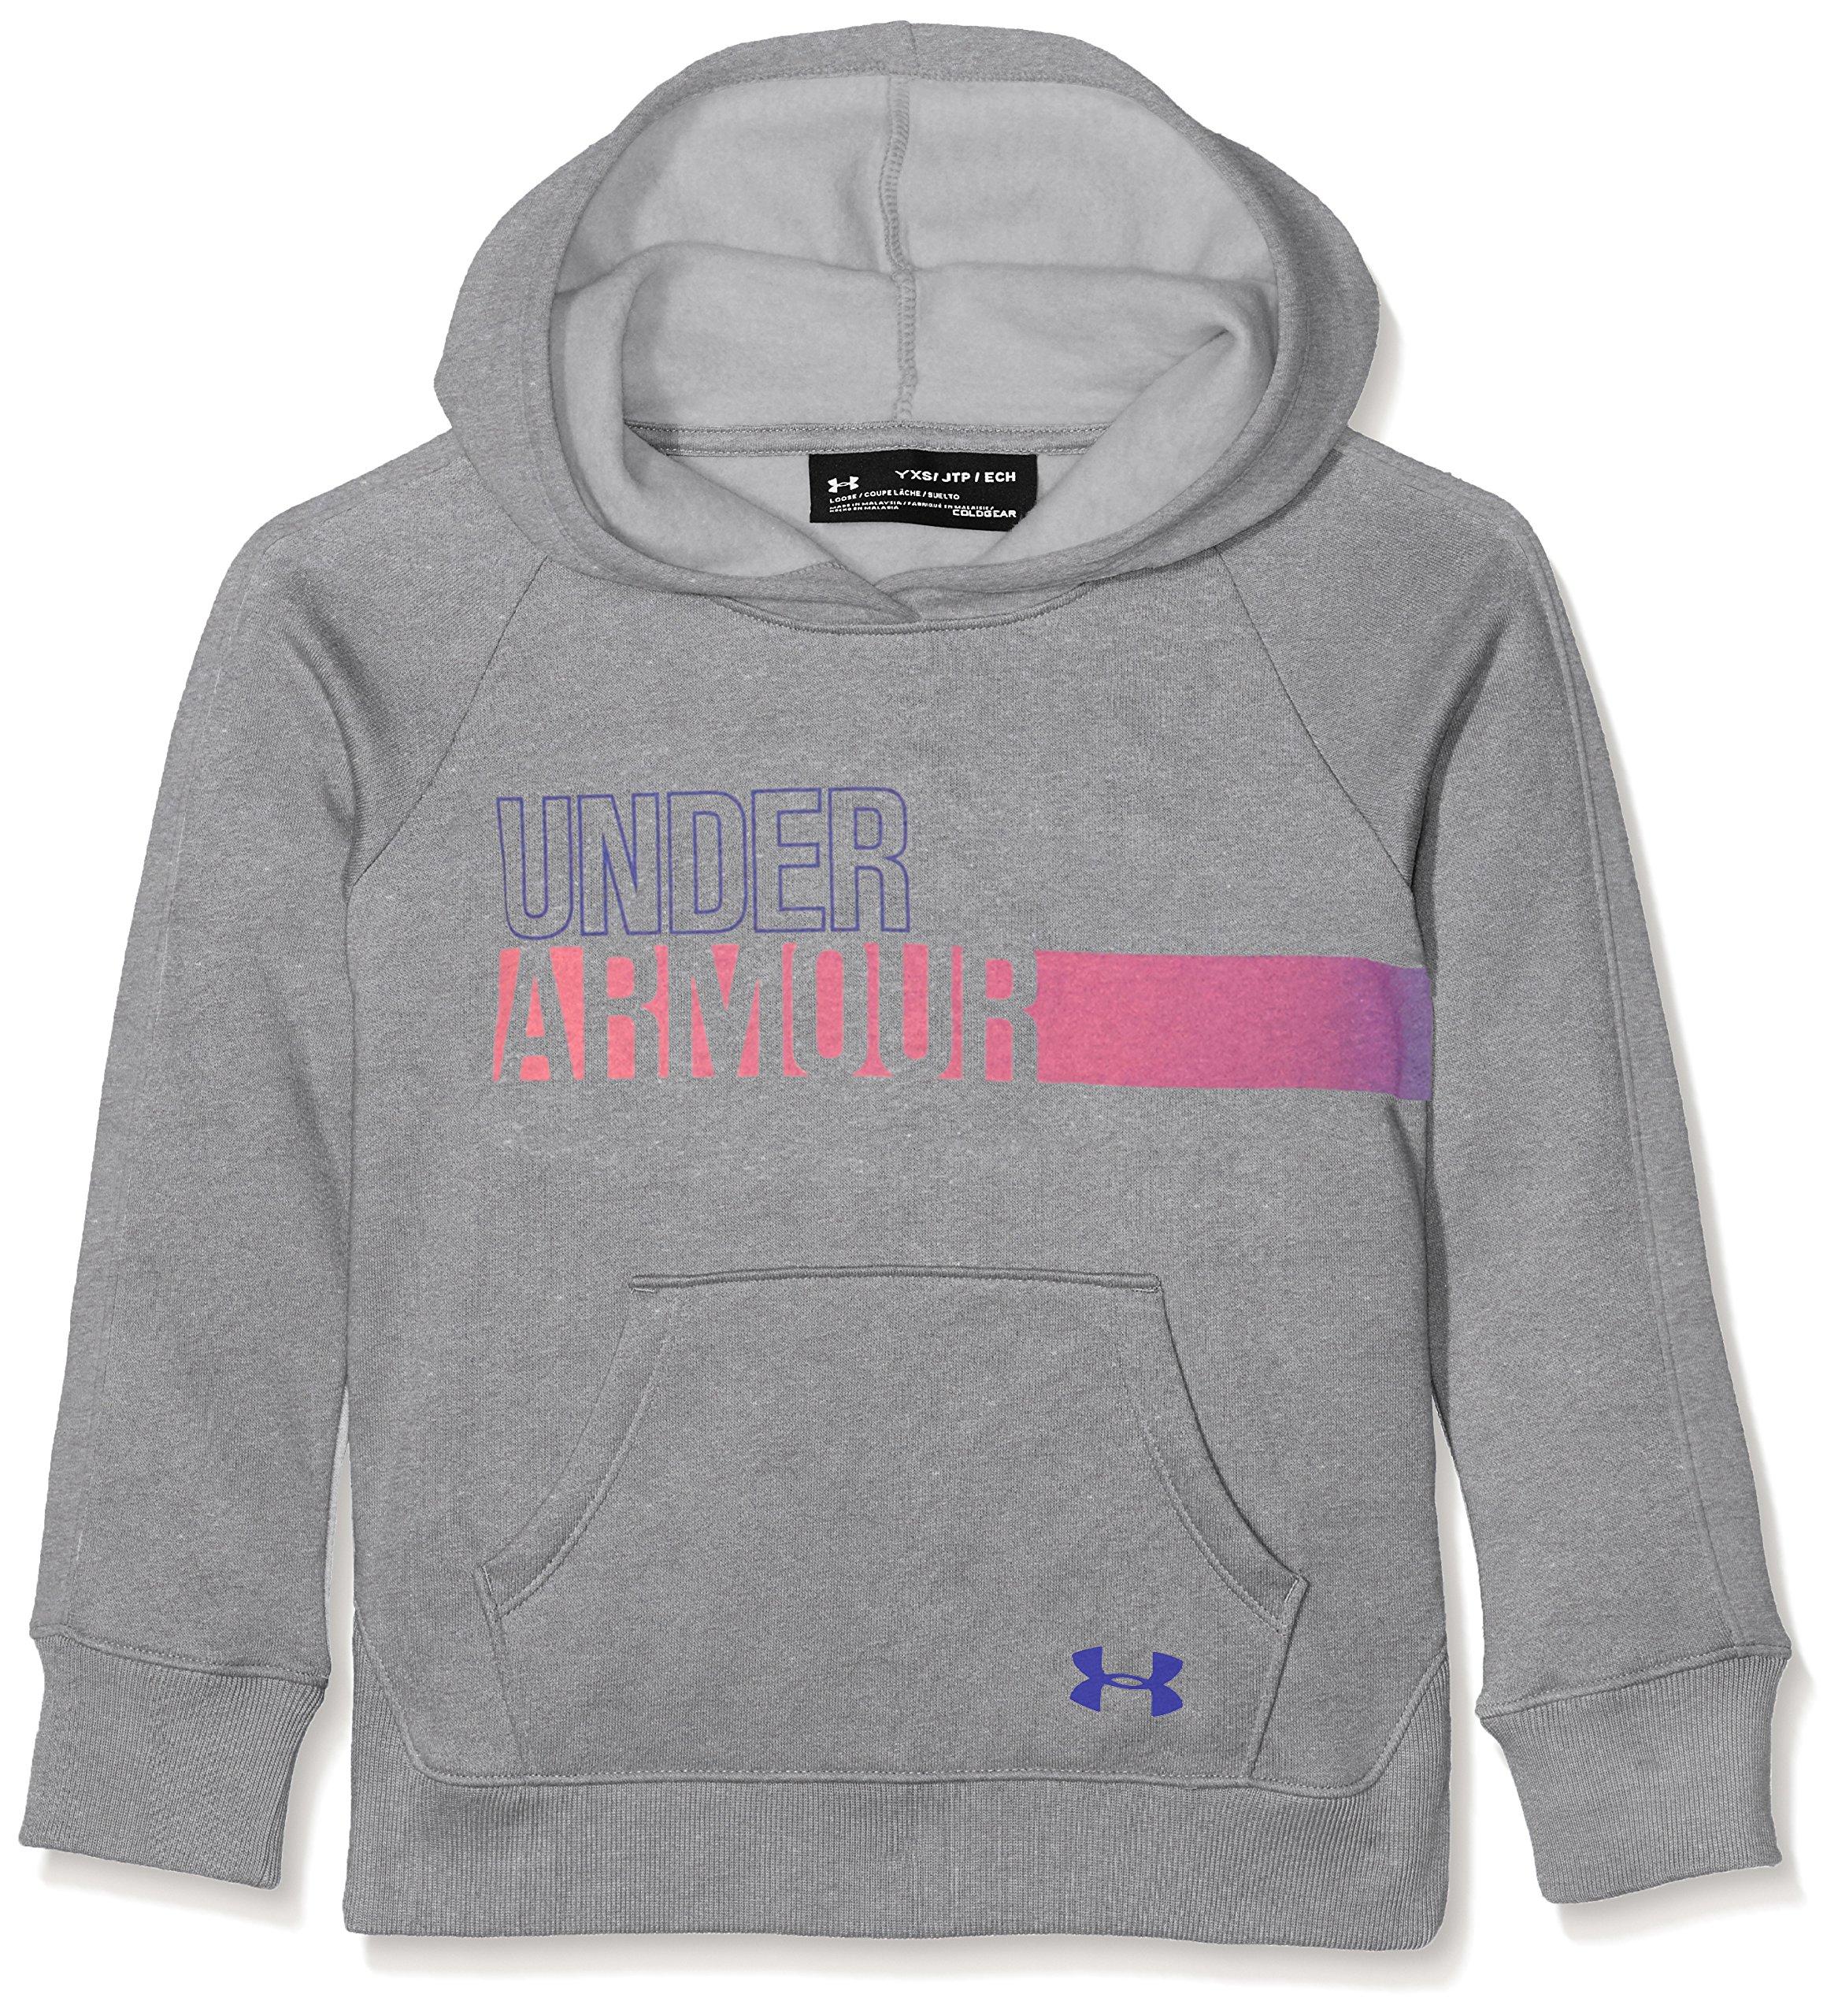 Under Armour Girls' Favorite Fleece Hoodie,Steel (035), Youth X-Large